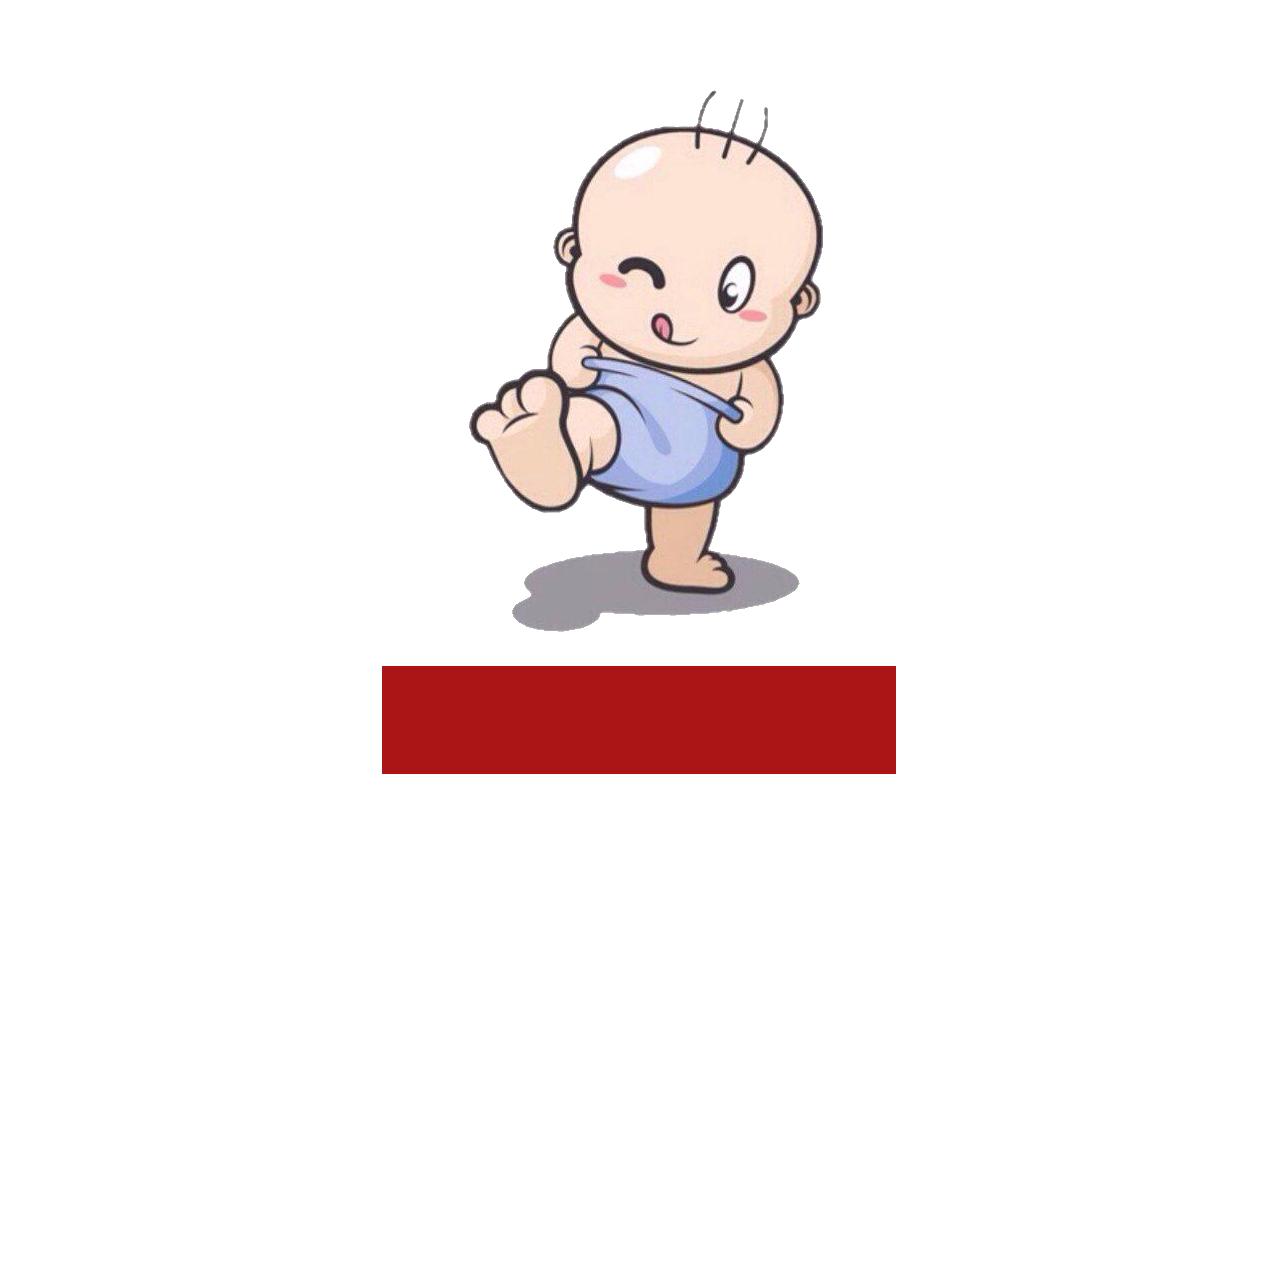 SHOP BiBo Shop Mẹ và Bé Sendo: Mua bán Online đảm bảo bởi FPT